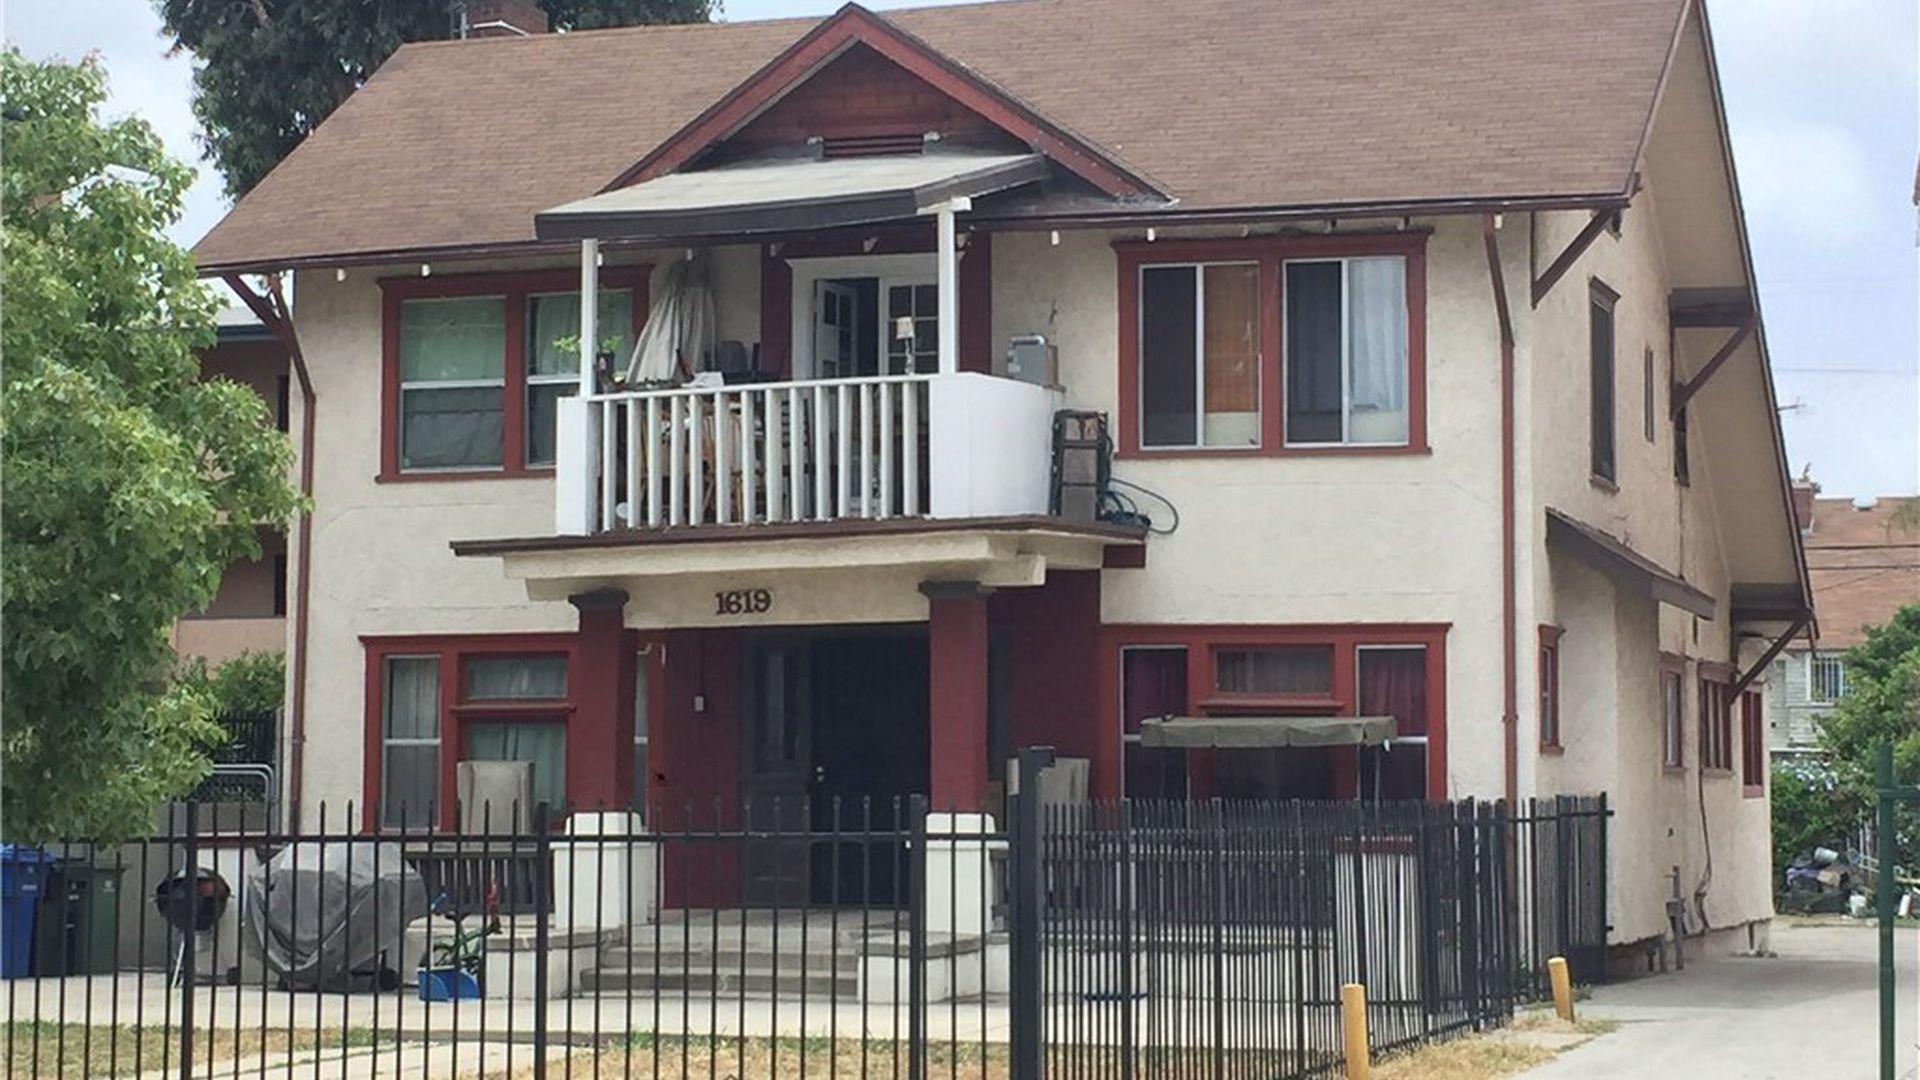 Arlington Heights Real Estate - Arlington Heights Los